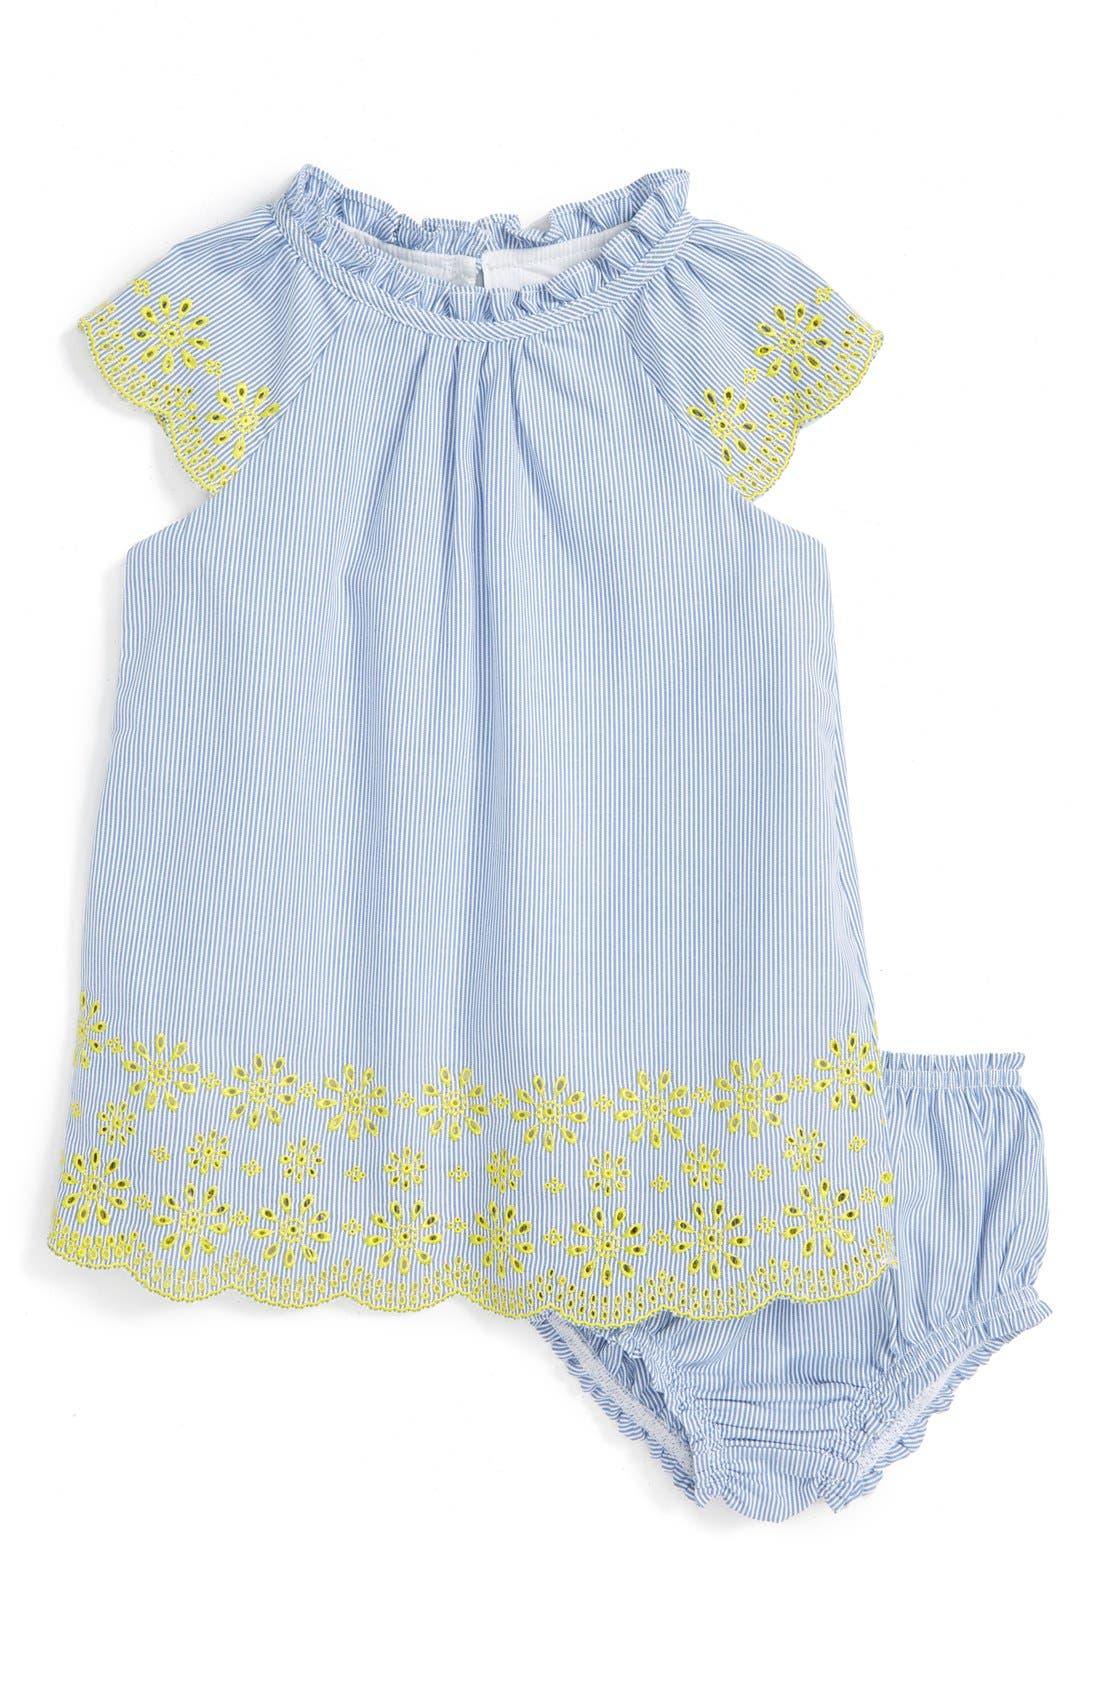 kate spade new york bedford cord dress Baby Girls